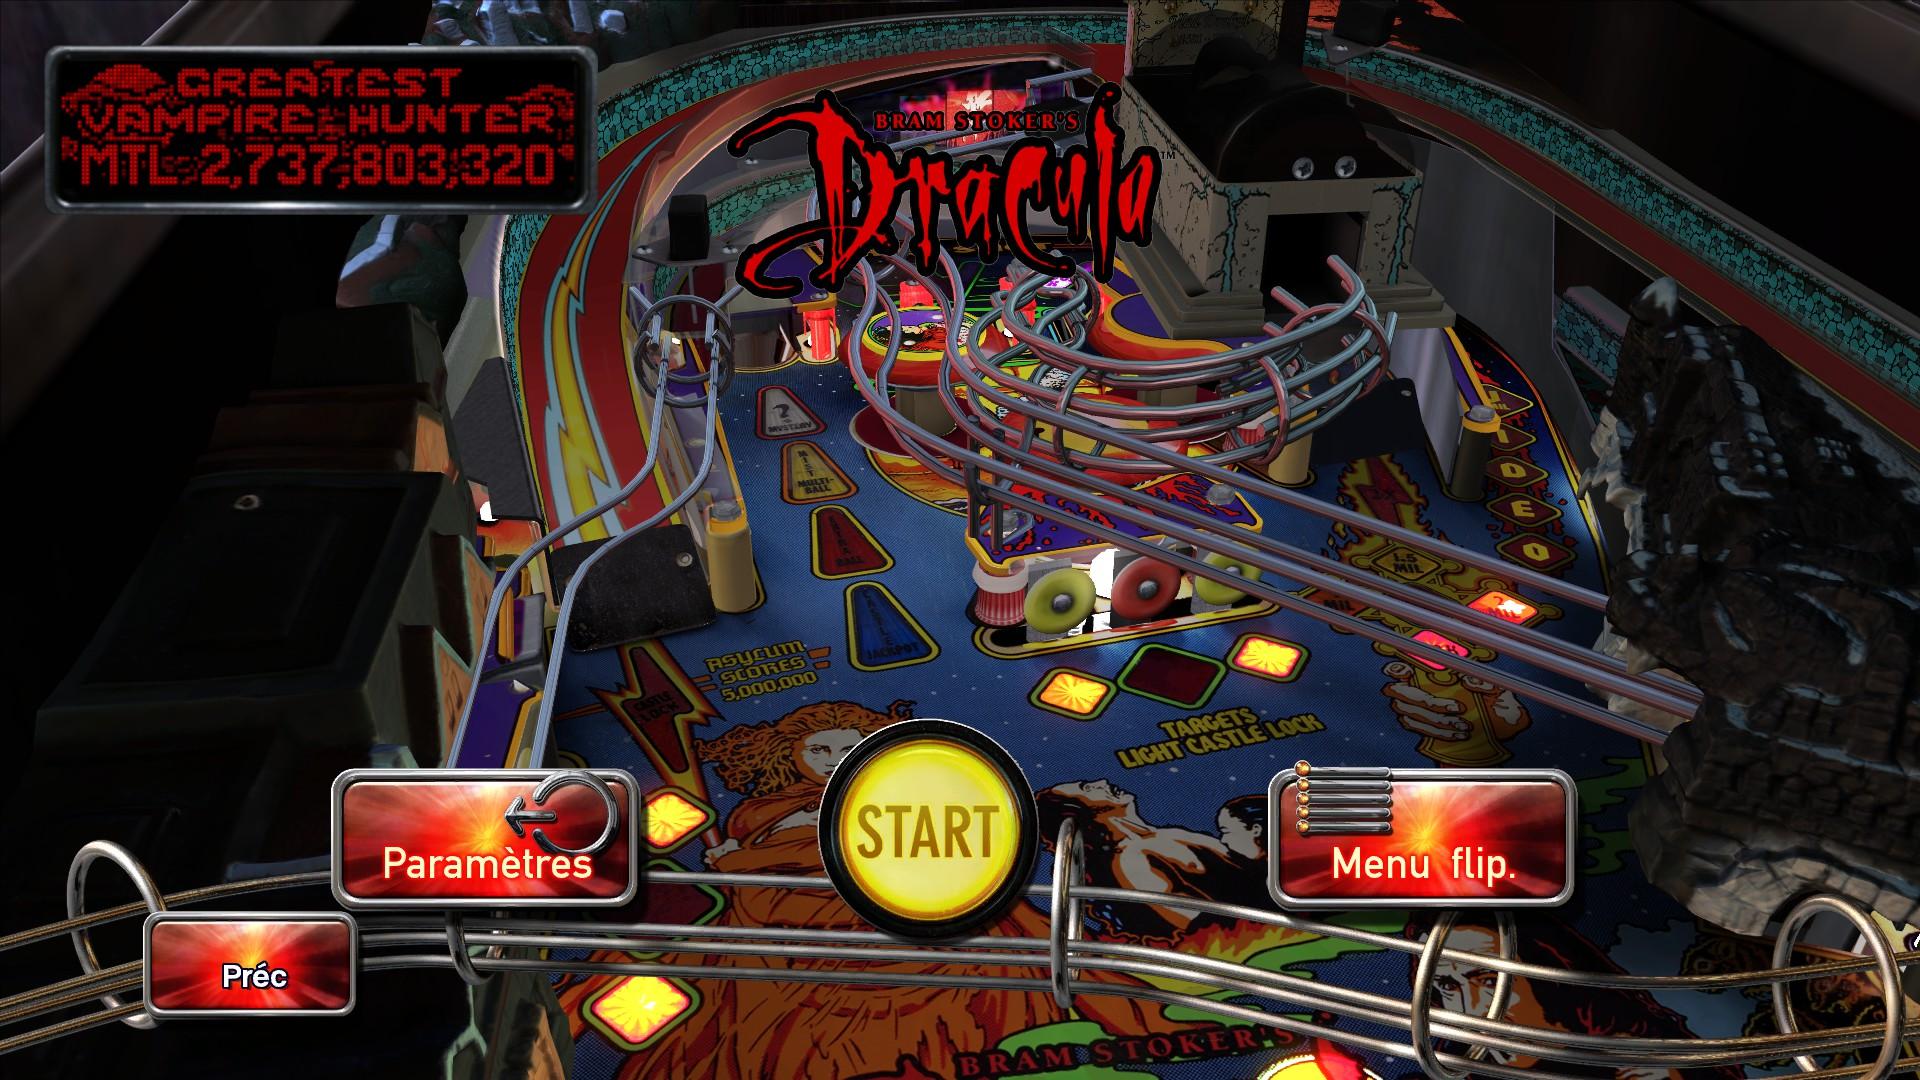 Mantalow: Pinball Arcade: Bram Stoker